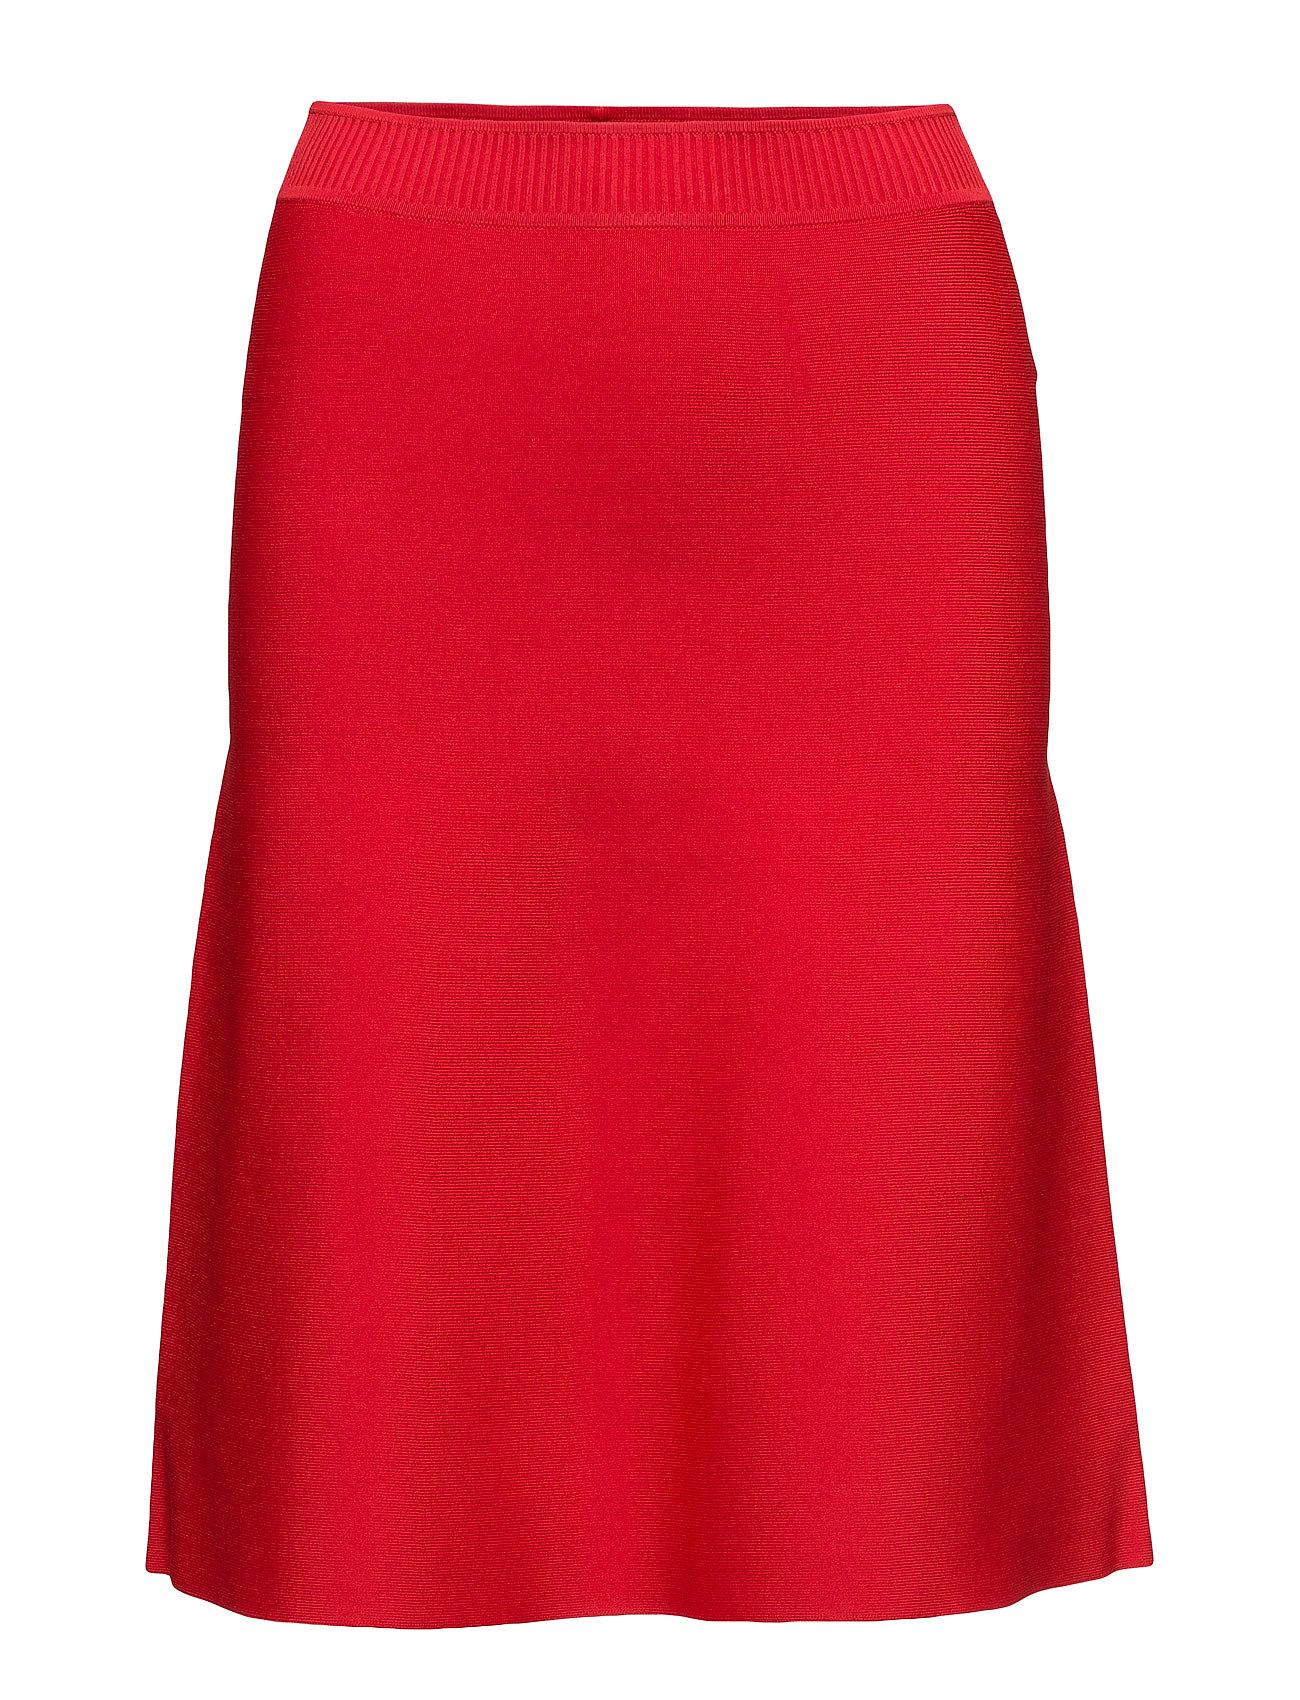 Dull rayon knit a-line flare skirt fra t by alexander wang på boozt.com dk